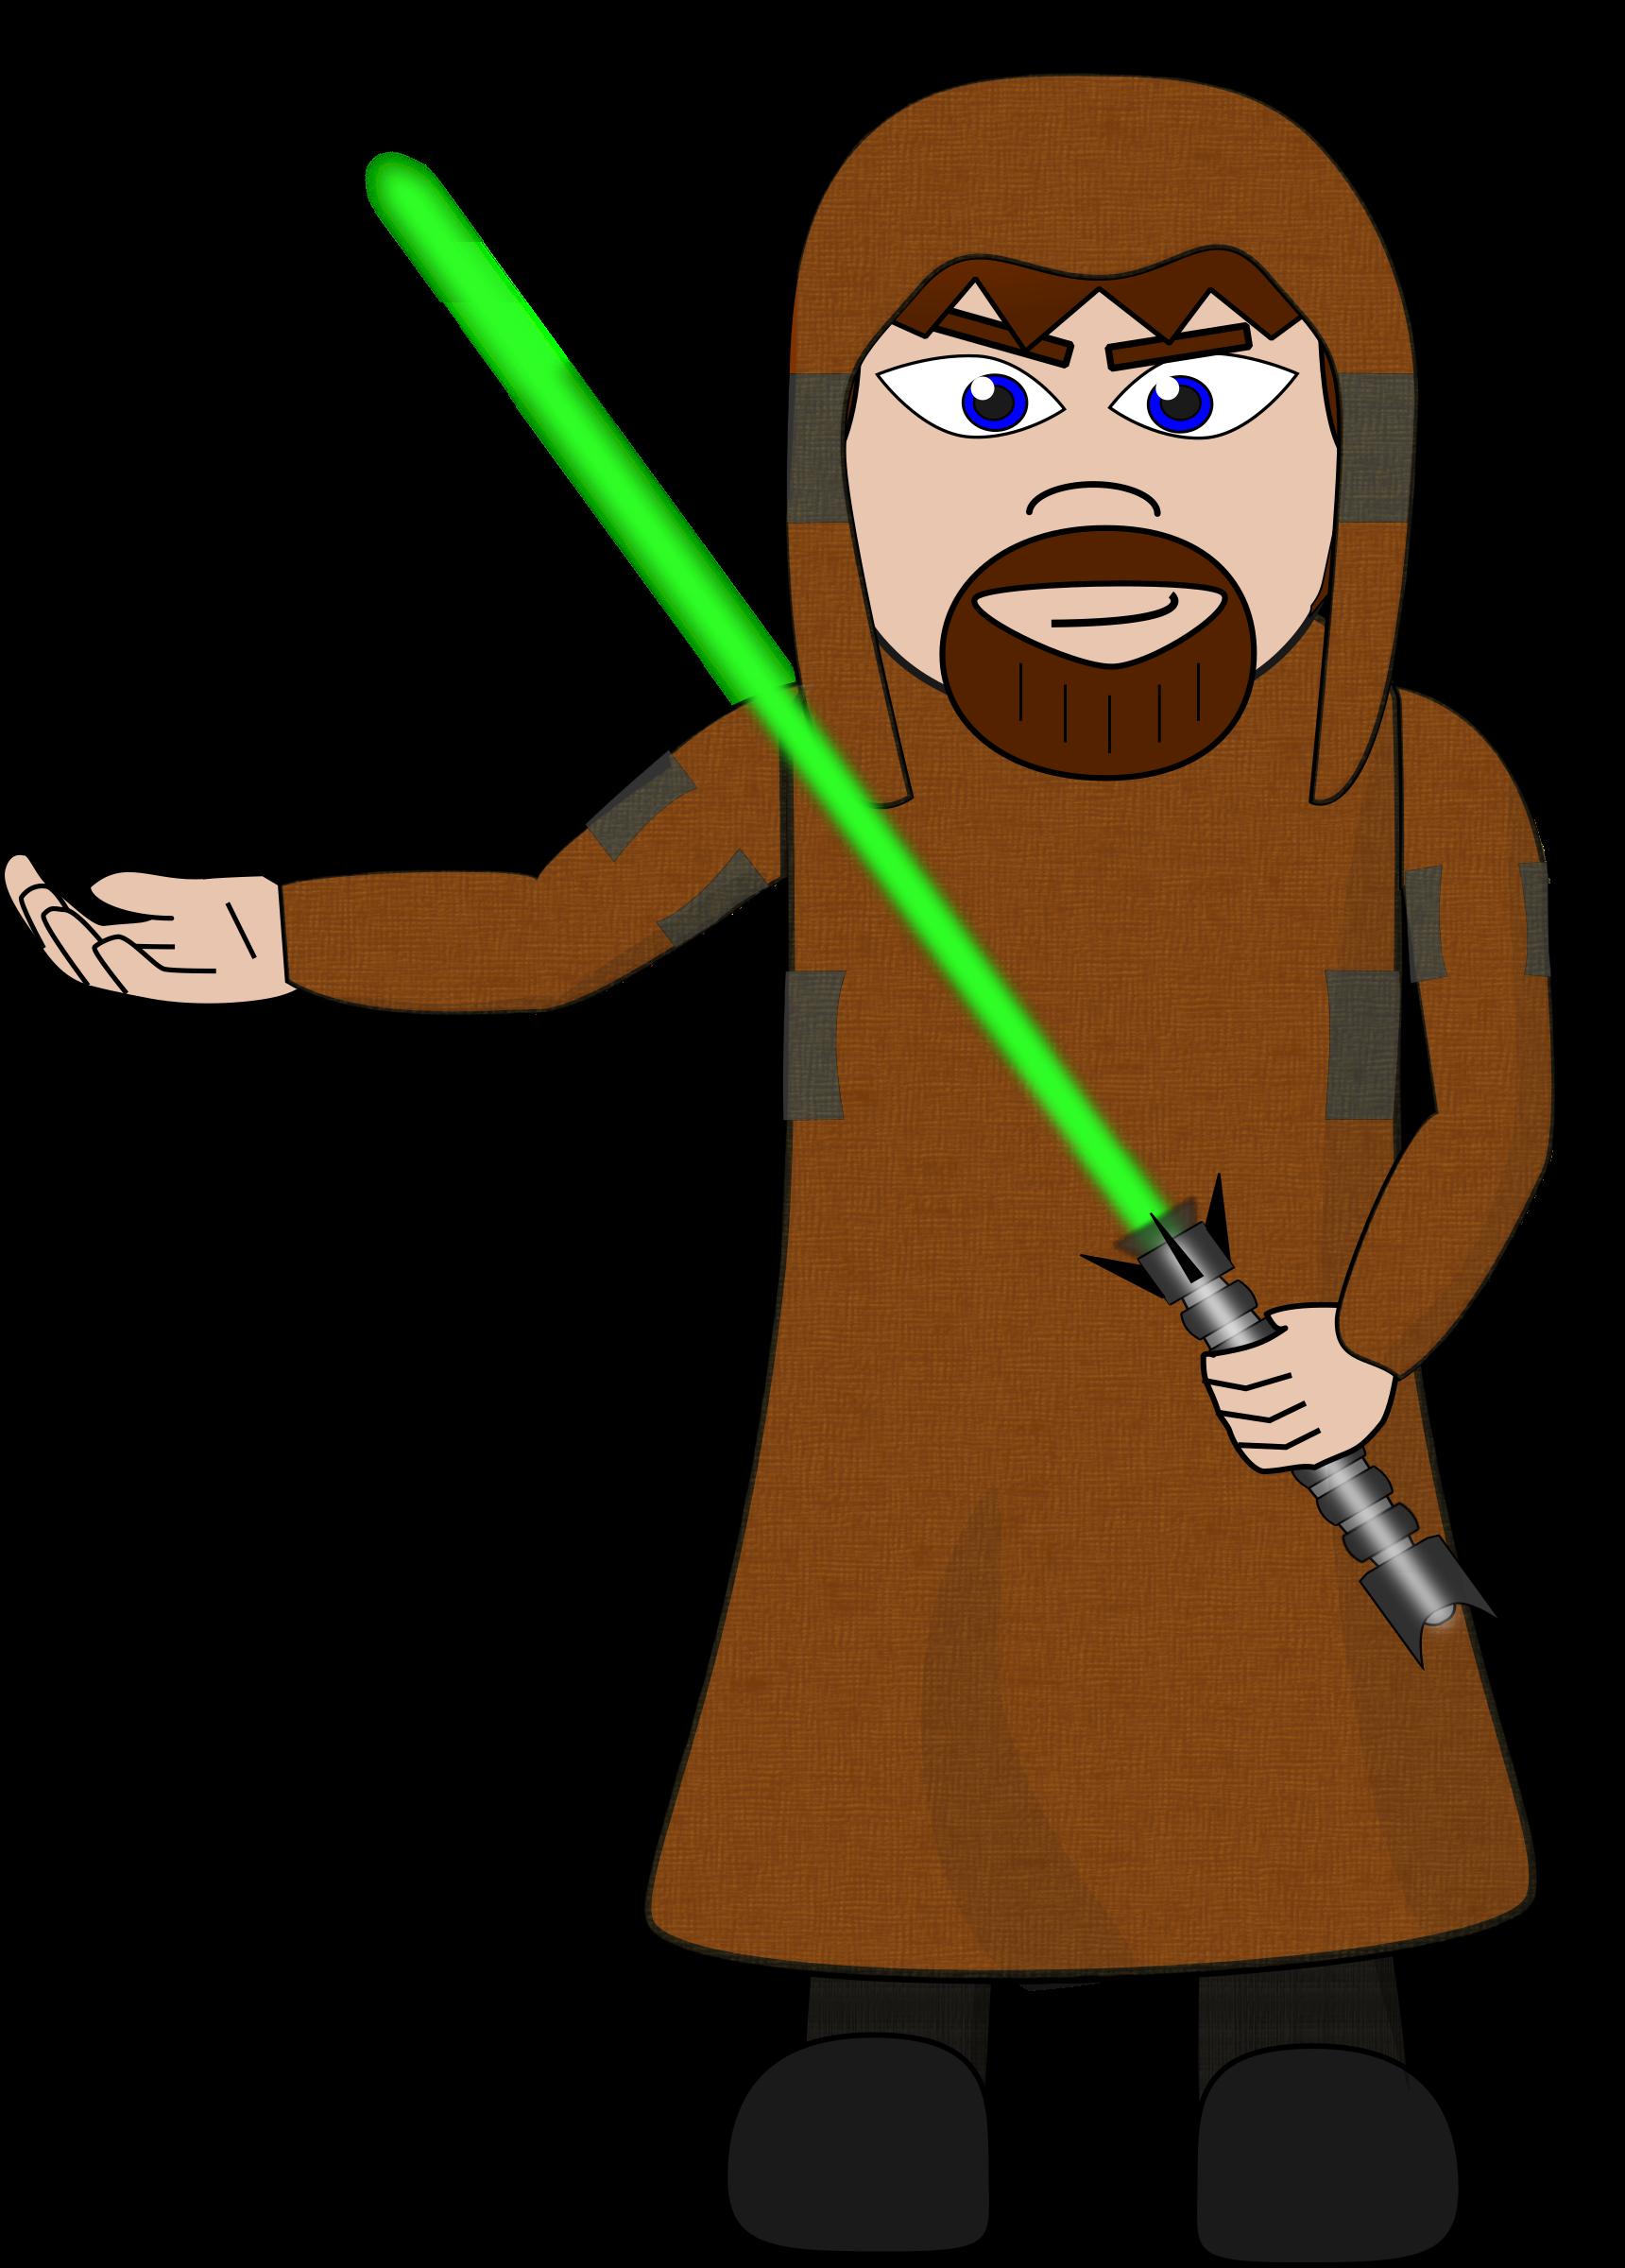 Jedi knight clipart banner library Jedi knight vector clipart free public domain stock photo cc0 ... banner library